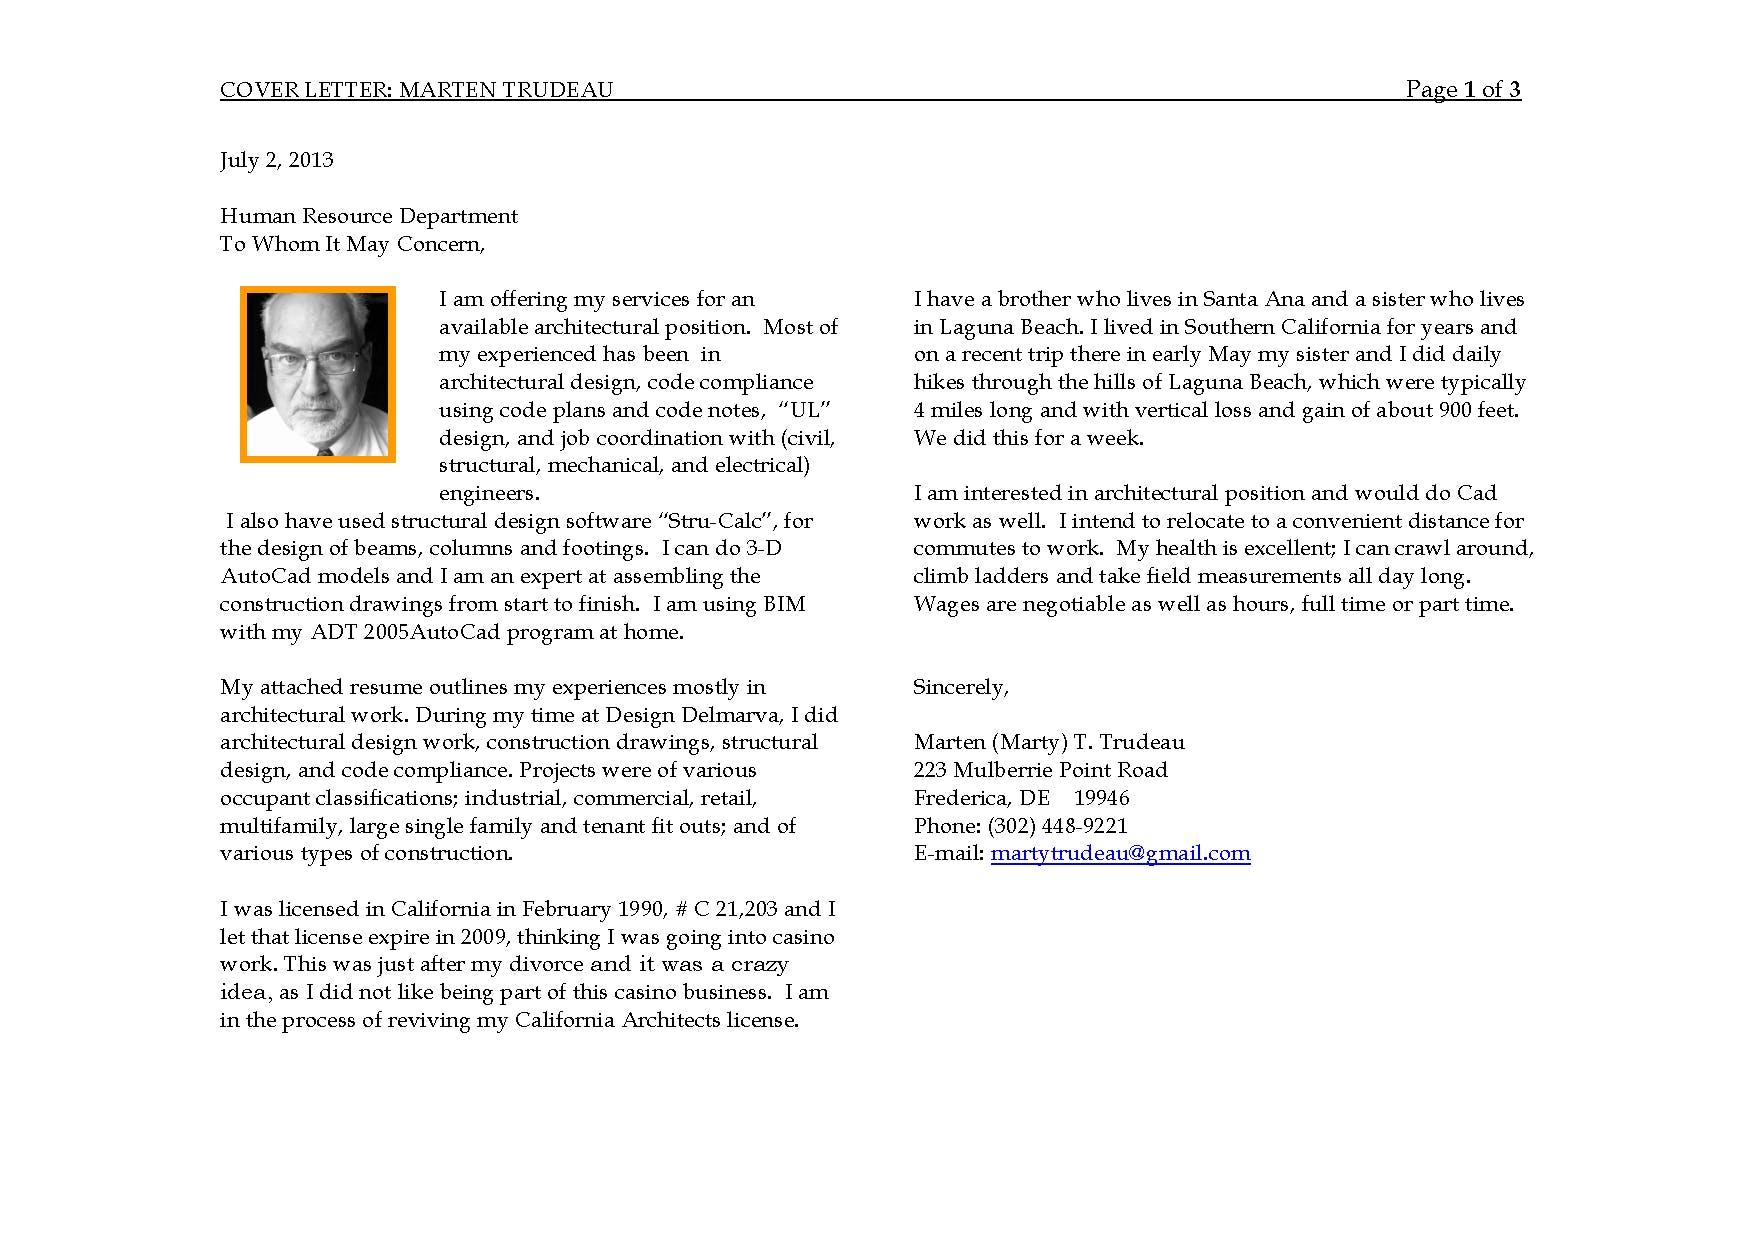 Cover letter and angler office preliminary design marten trudeau cover letter spiritdancerdesigns Images